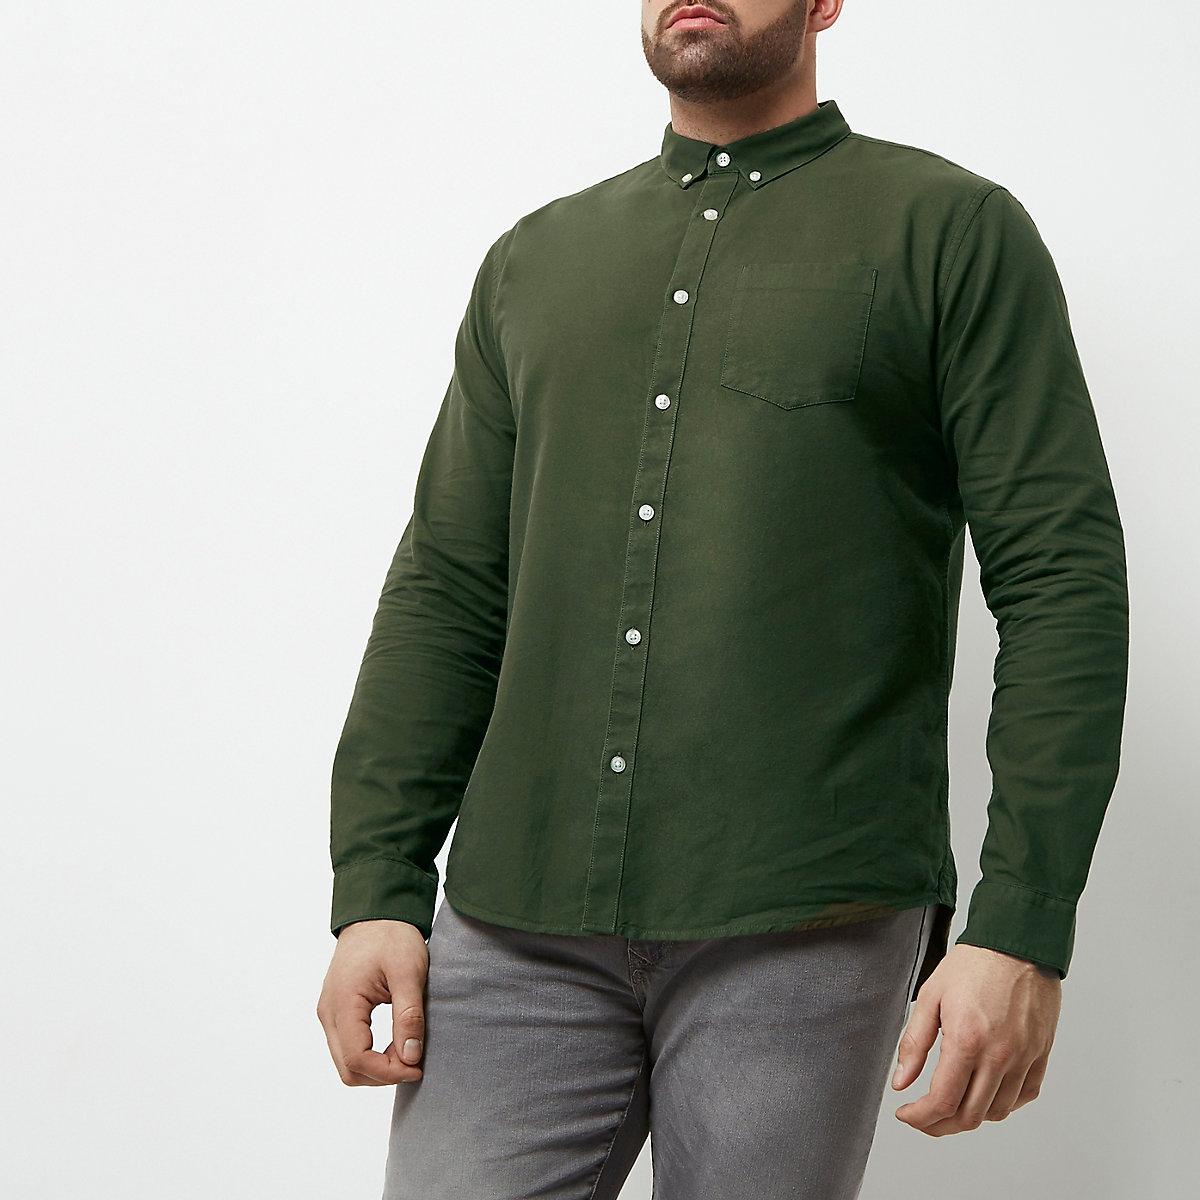 Big and Tall khaki green Oxford shirt